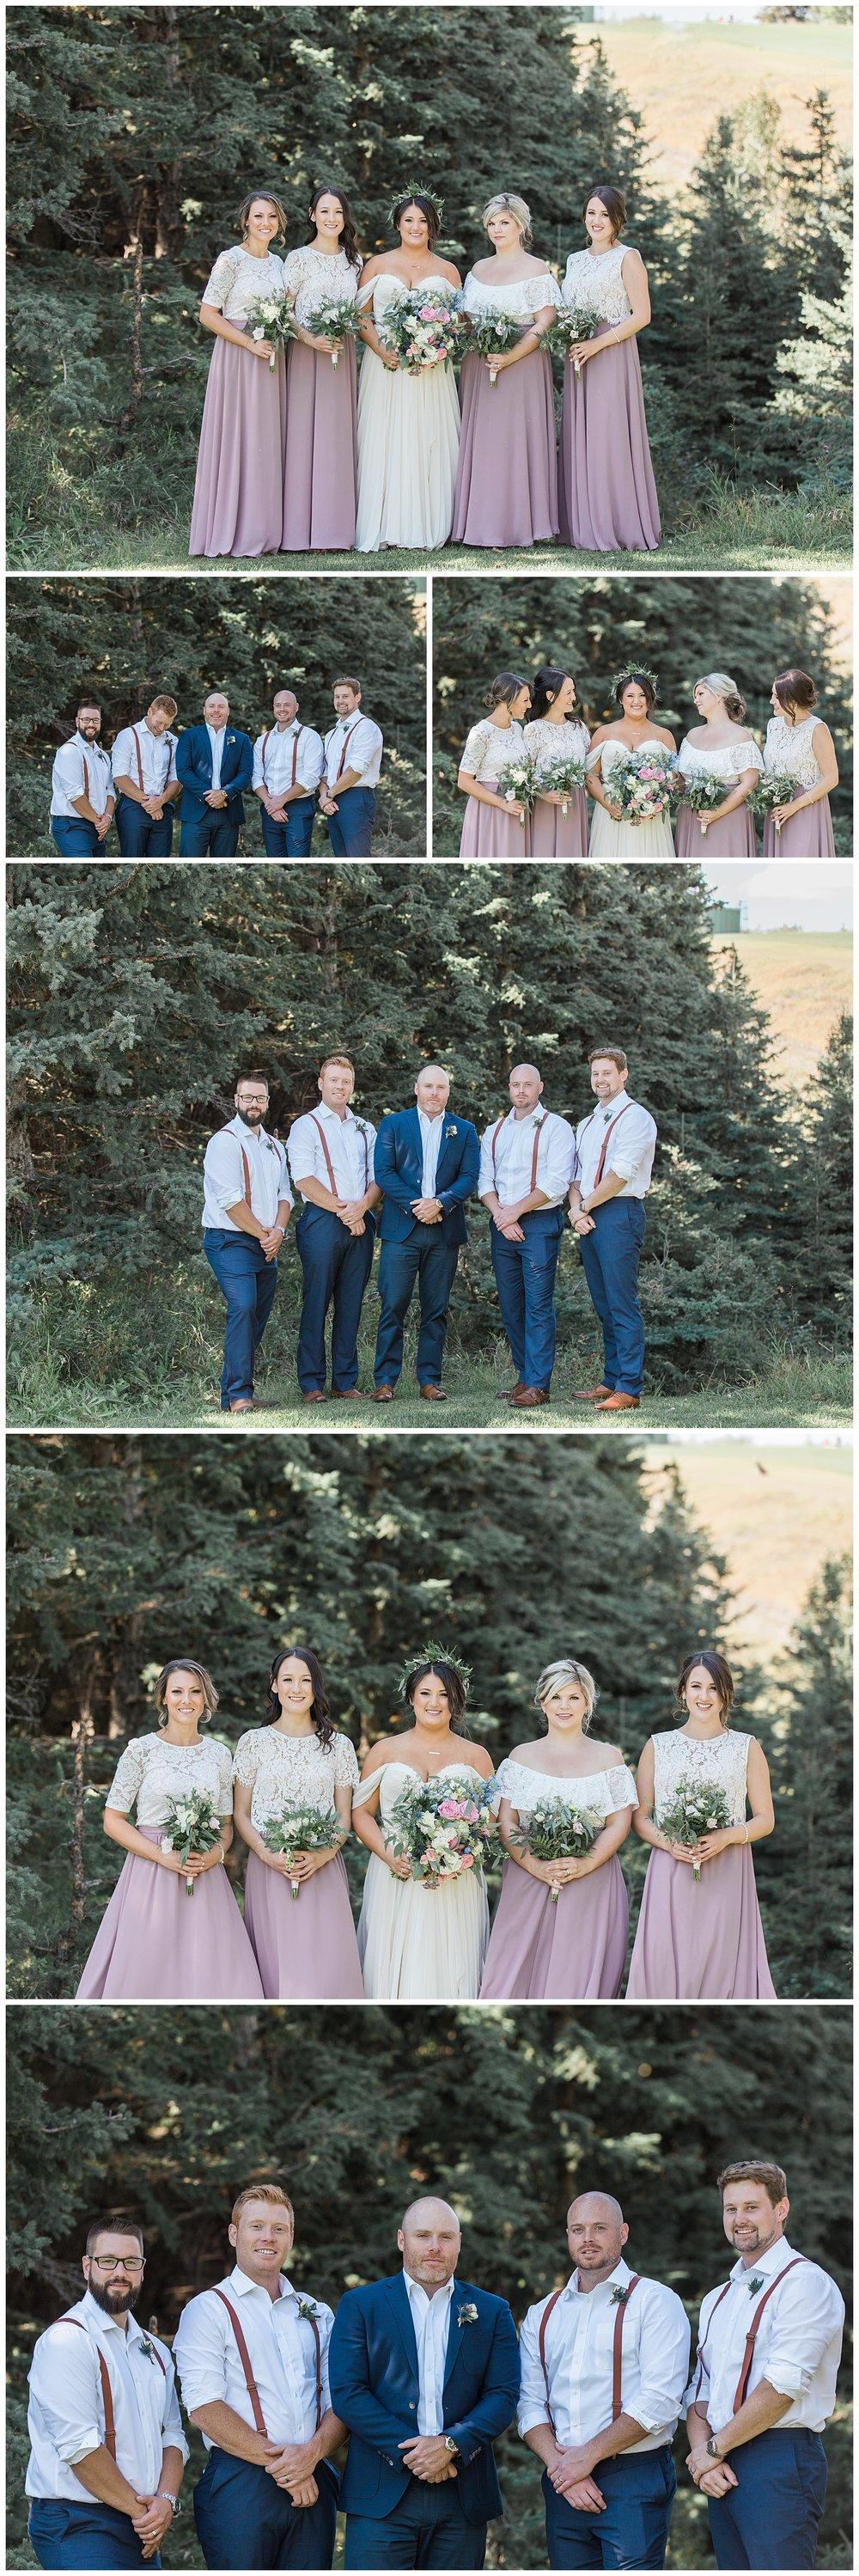 Calgary-wedding-photographer-springbank-links-golf-course-_0006.jpg